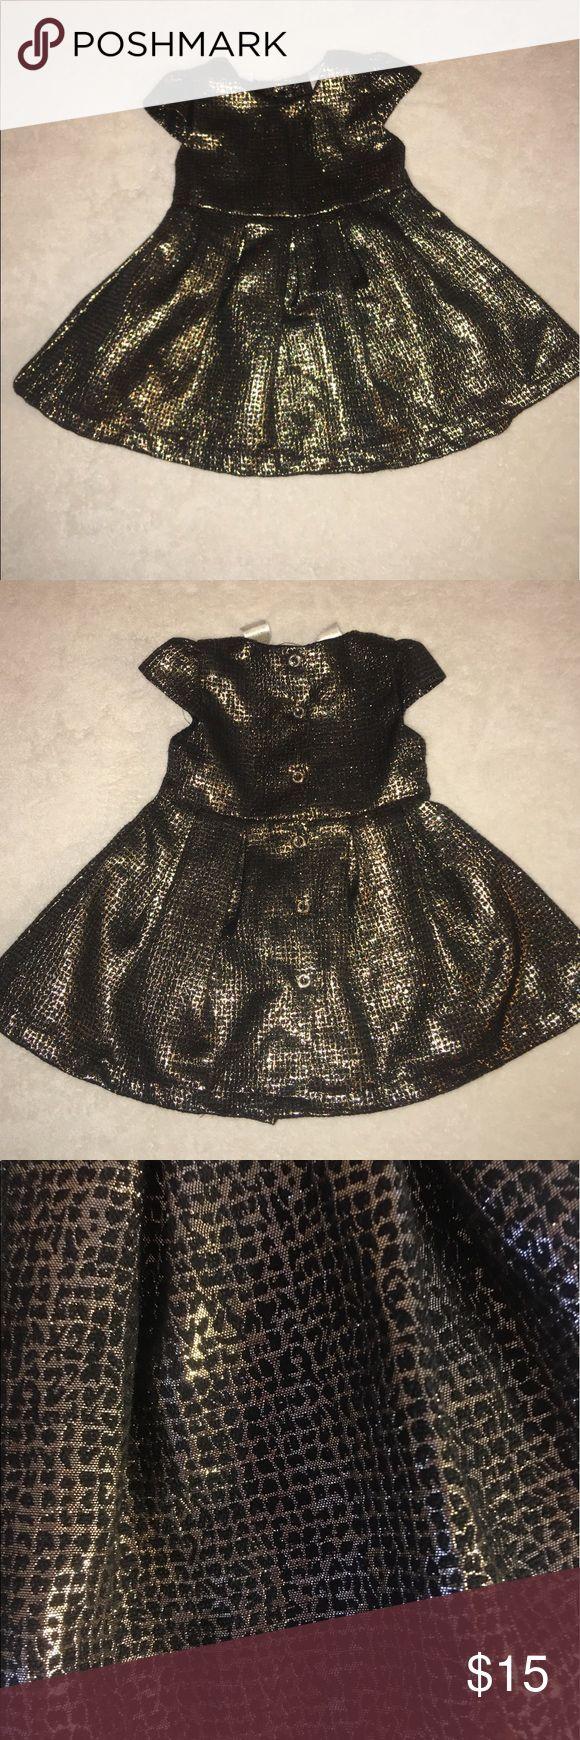 Kardashian kids dress Metallic gold and black dress. Buttons all the way down the back. Kardashian Kids Dresses Formal